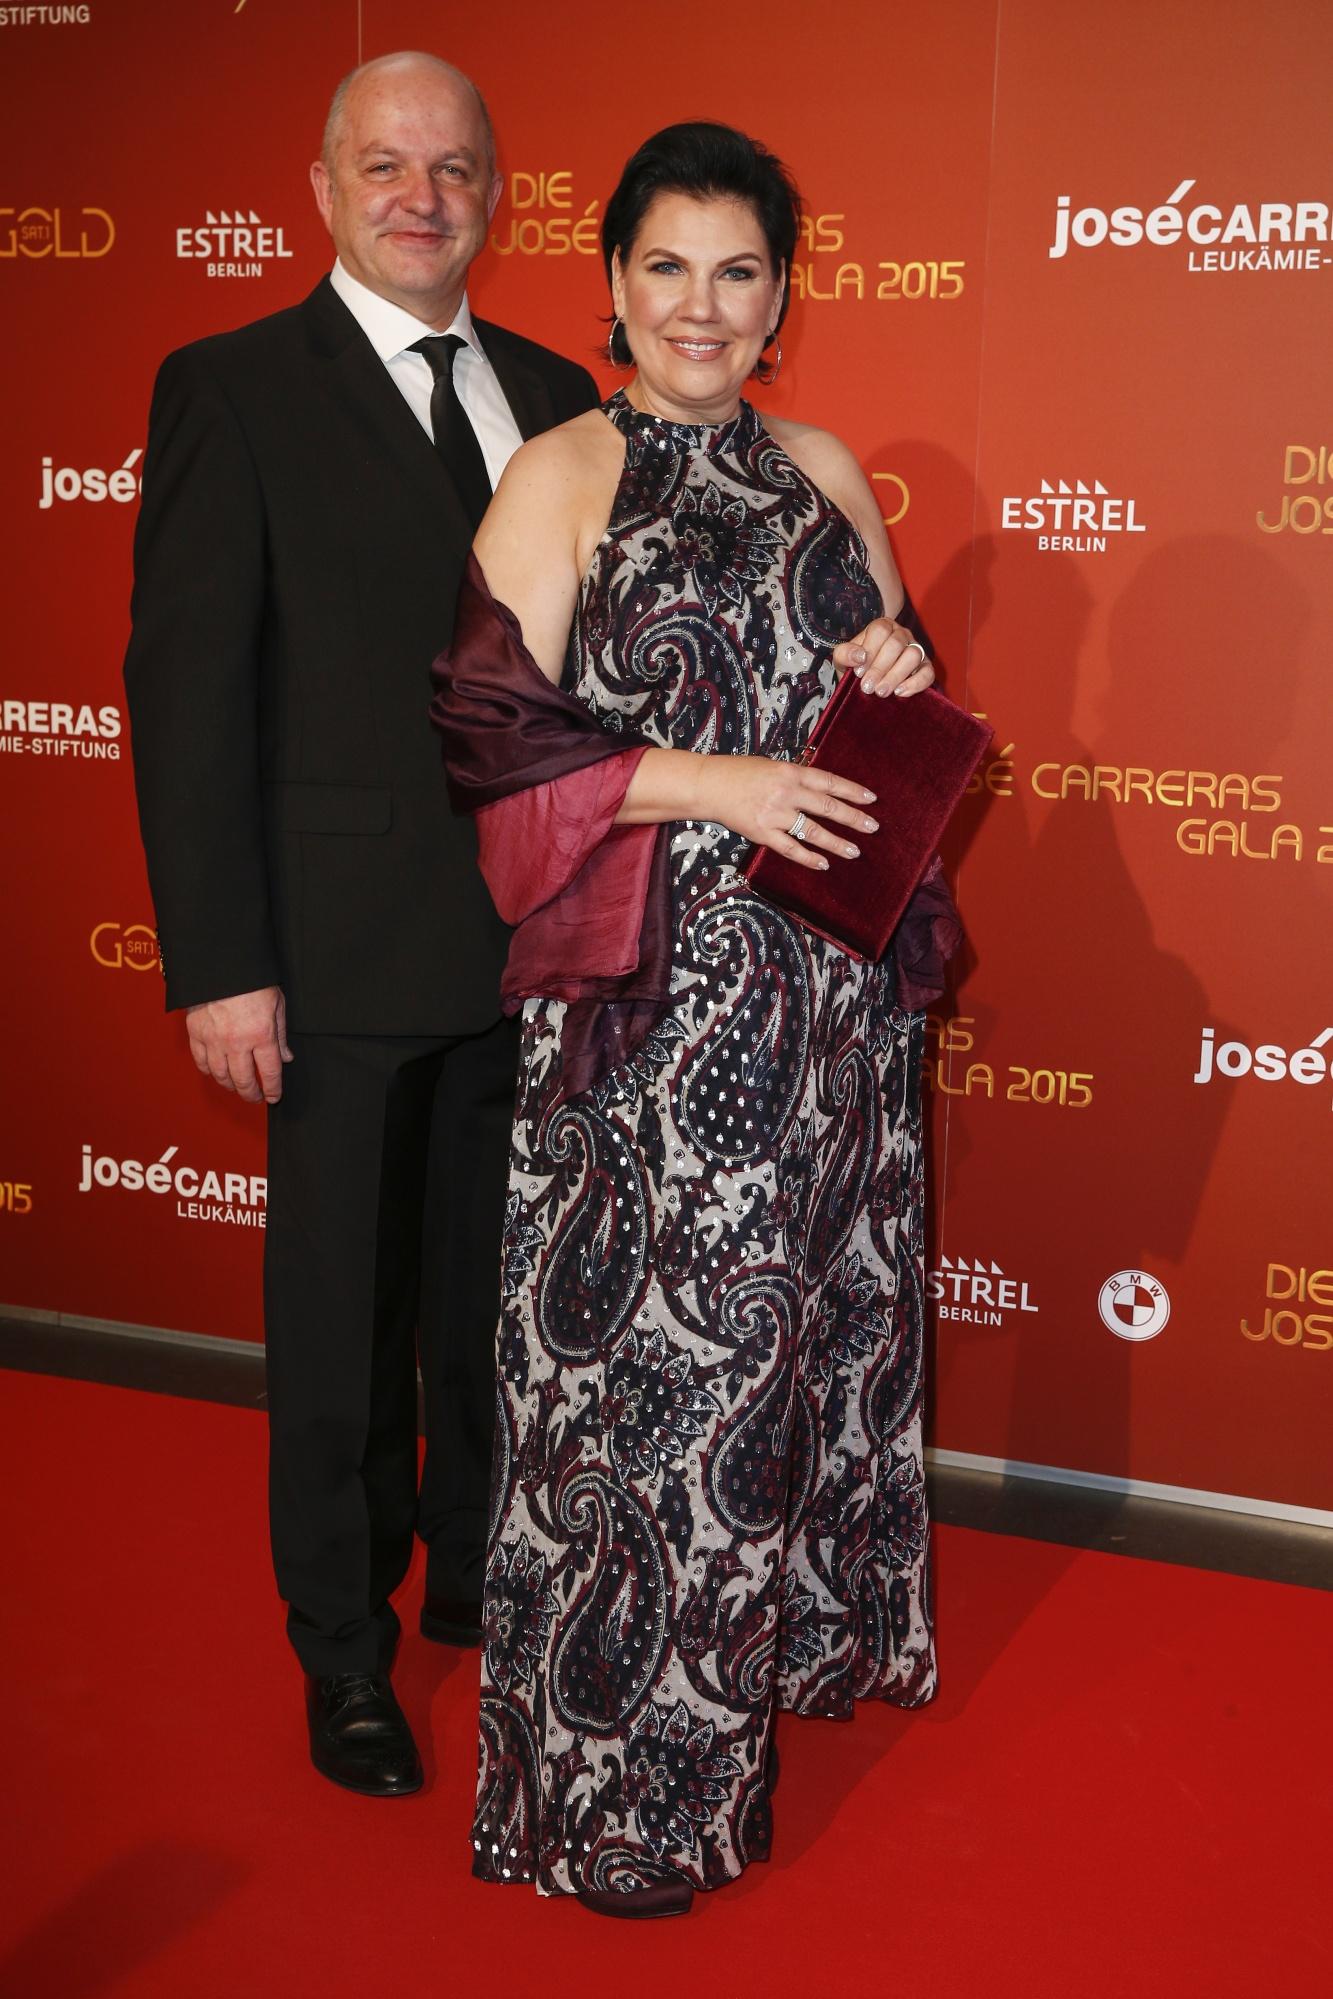 21th Annual Jose Carreras Gala